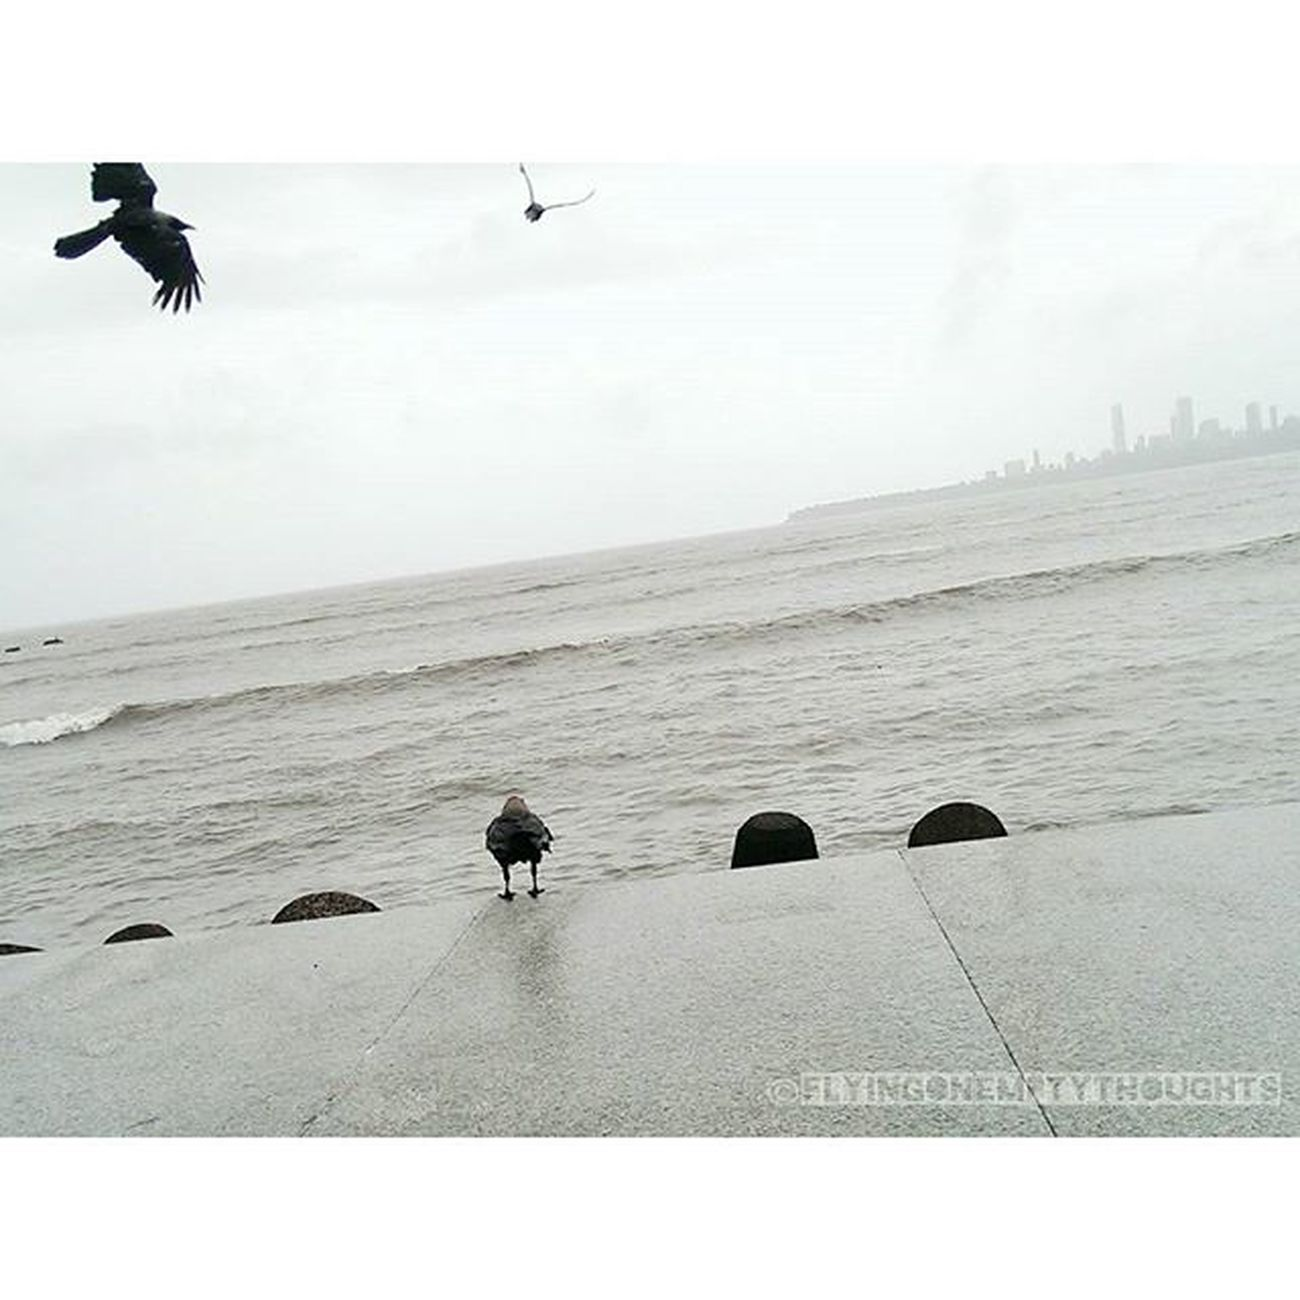 •Murder at the sea• (1) Mumbai Mumbai_uncensored Sea Toiphotoday worldphotographyday photography bnwbutnot birds nature VSCOcam bombay mumbaiigers city cityscapes landscape travel